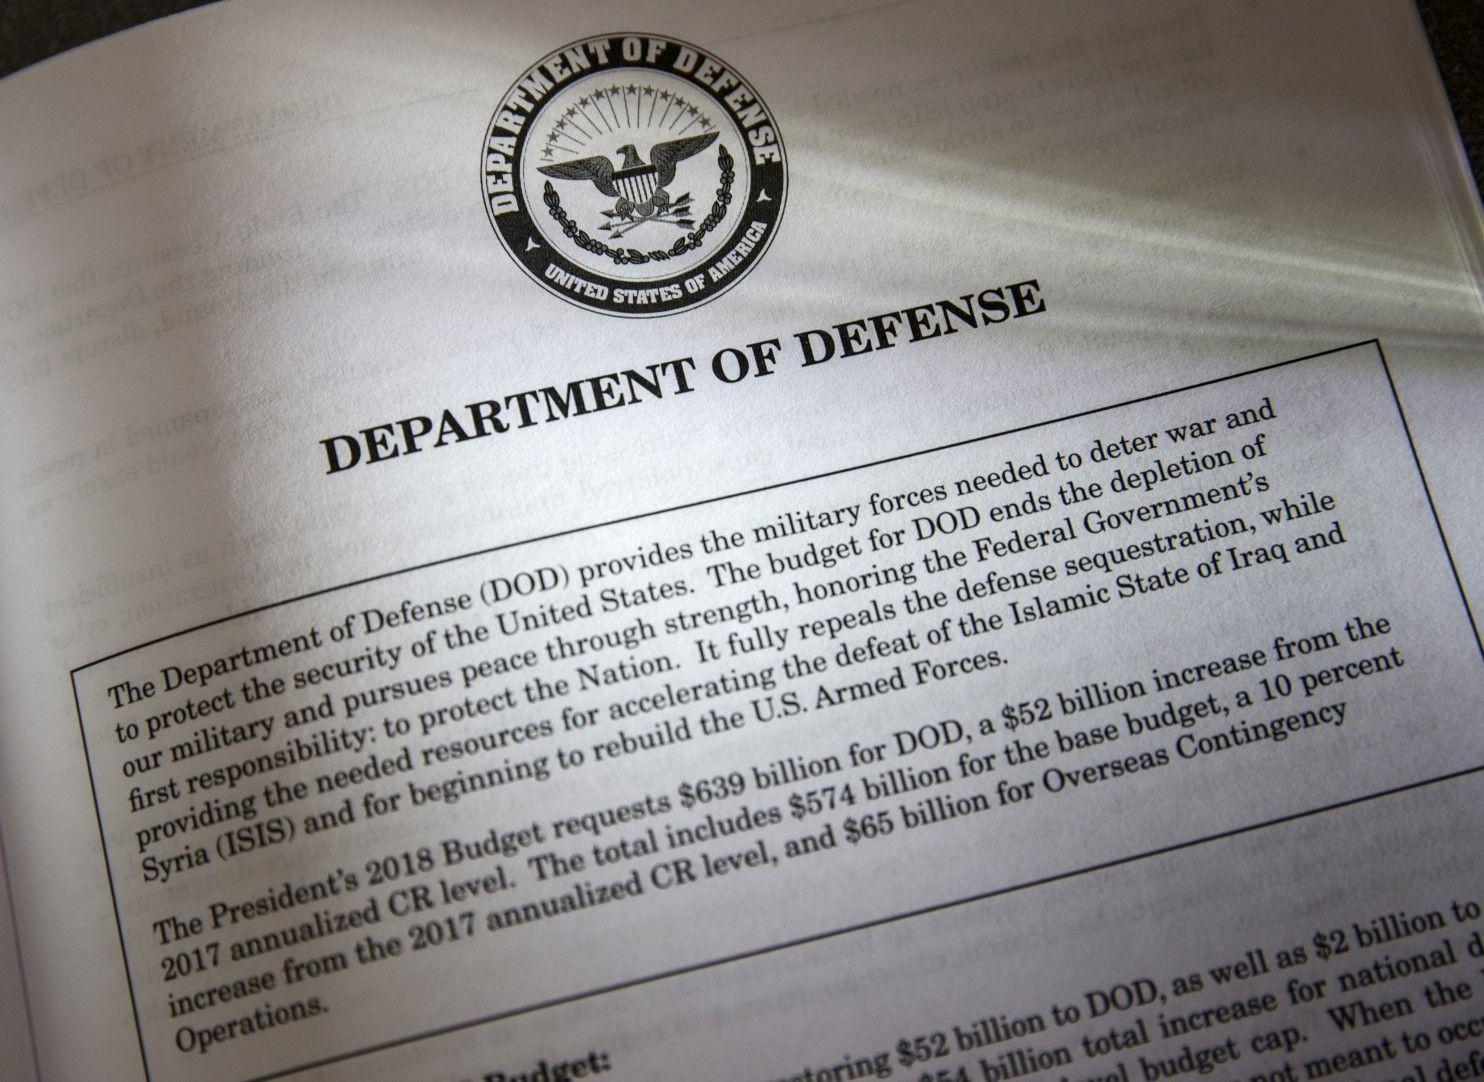 #Trump's defense budget boost raises questions on strategy - Washington Post: Washington Post Trump's defense budget boost raises questions…